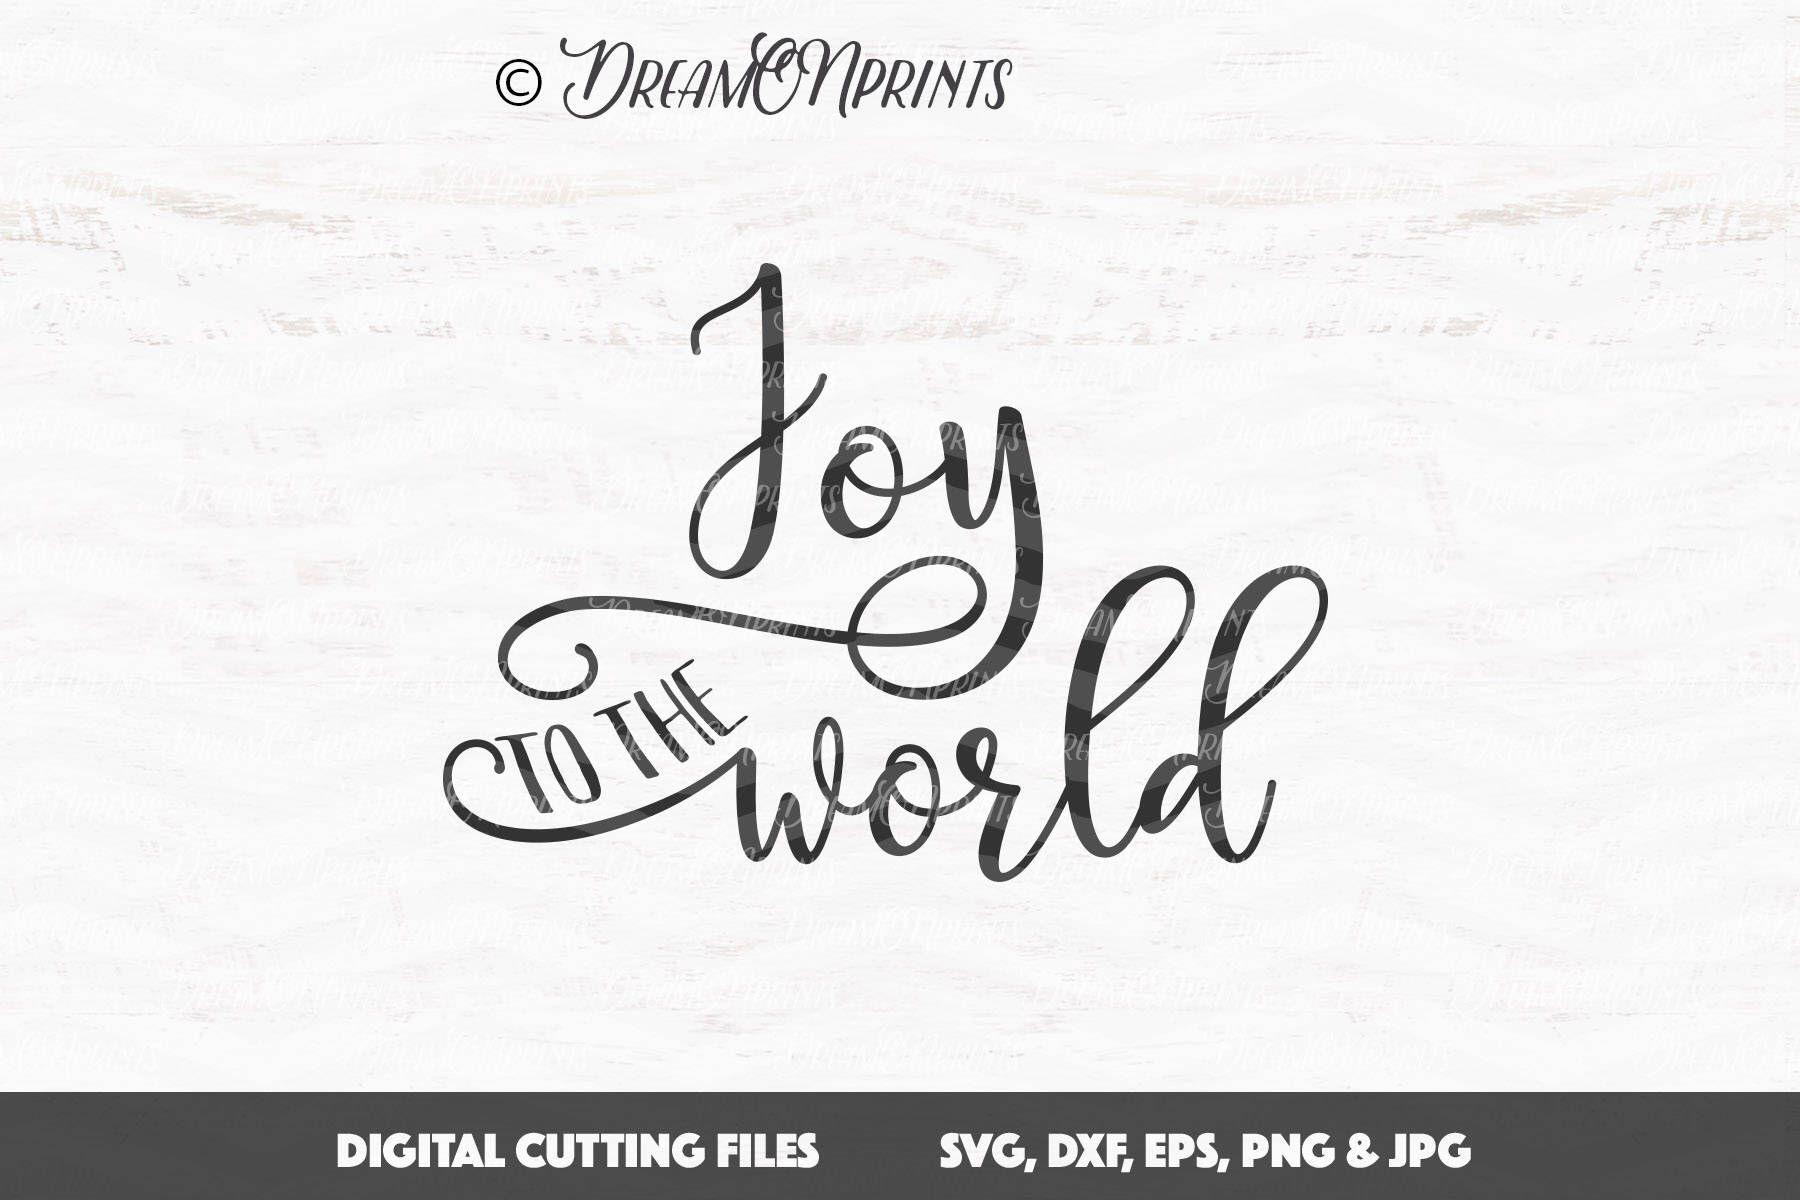 Joy to the World SVg Christmas SVG Files for Cricut